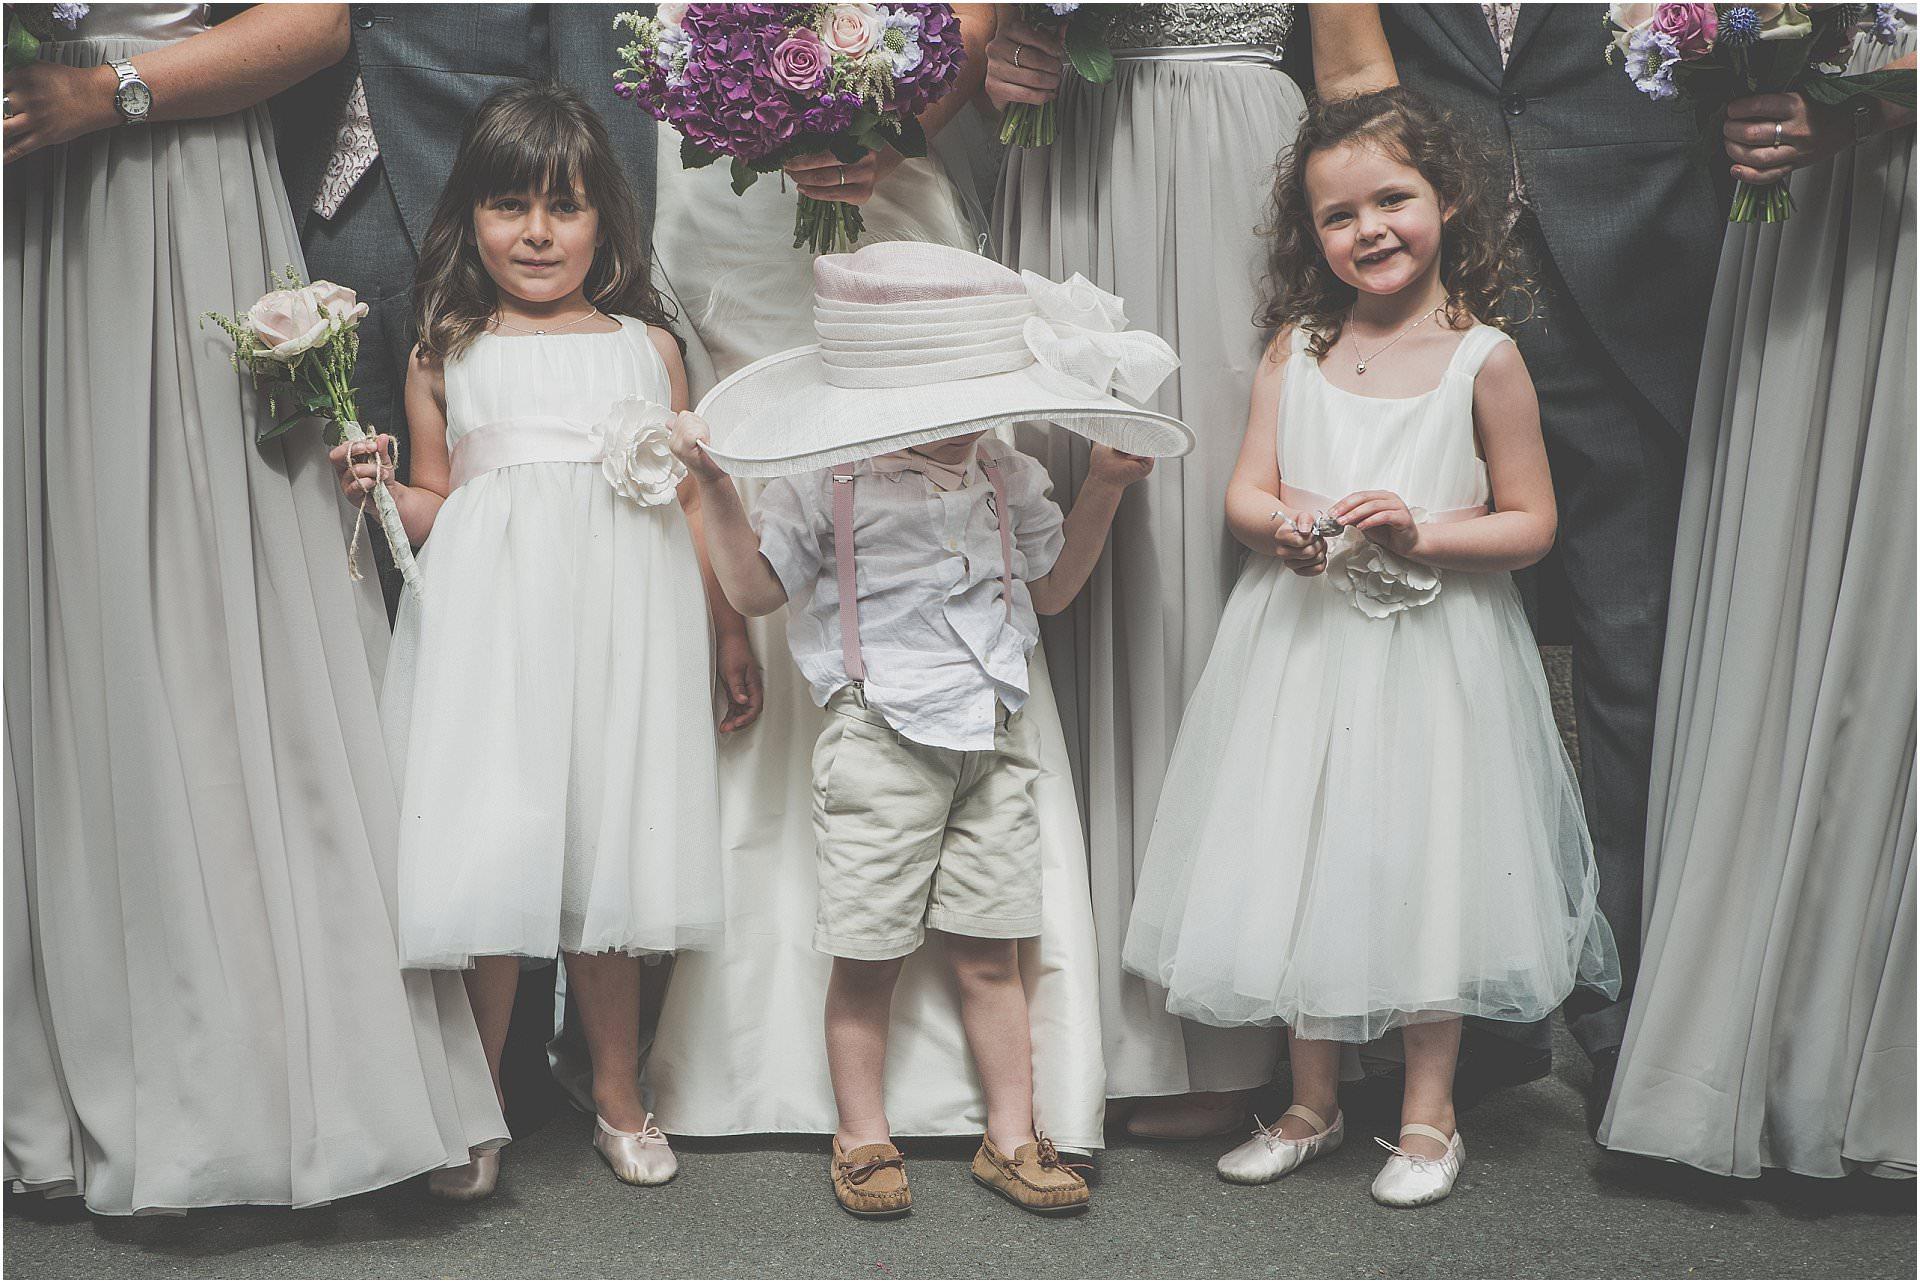 Lyde Court West Midlands Wedding Venue